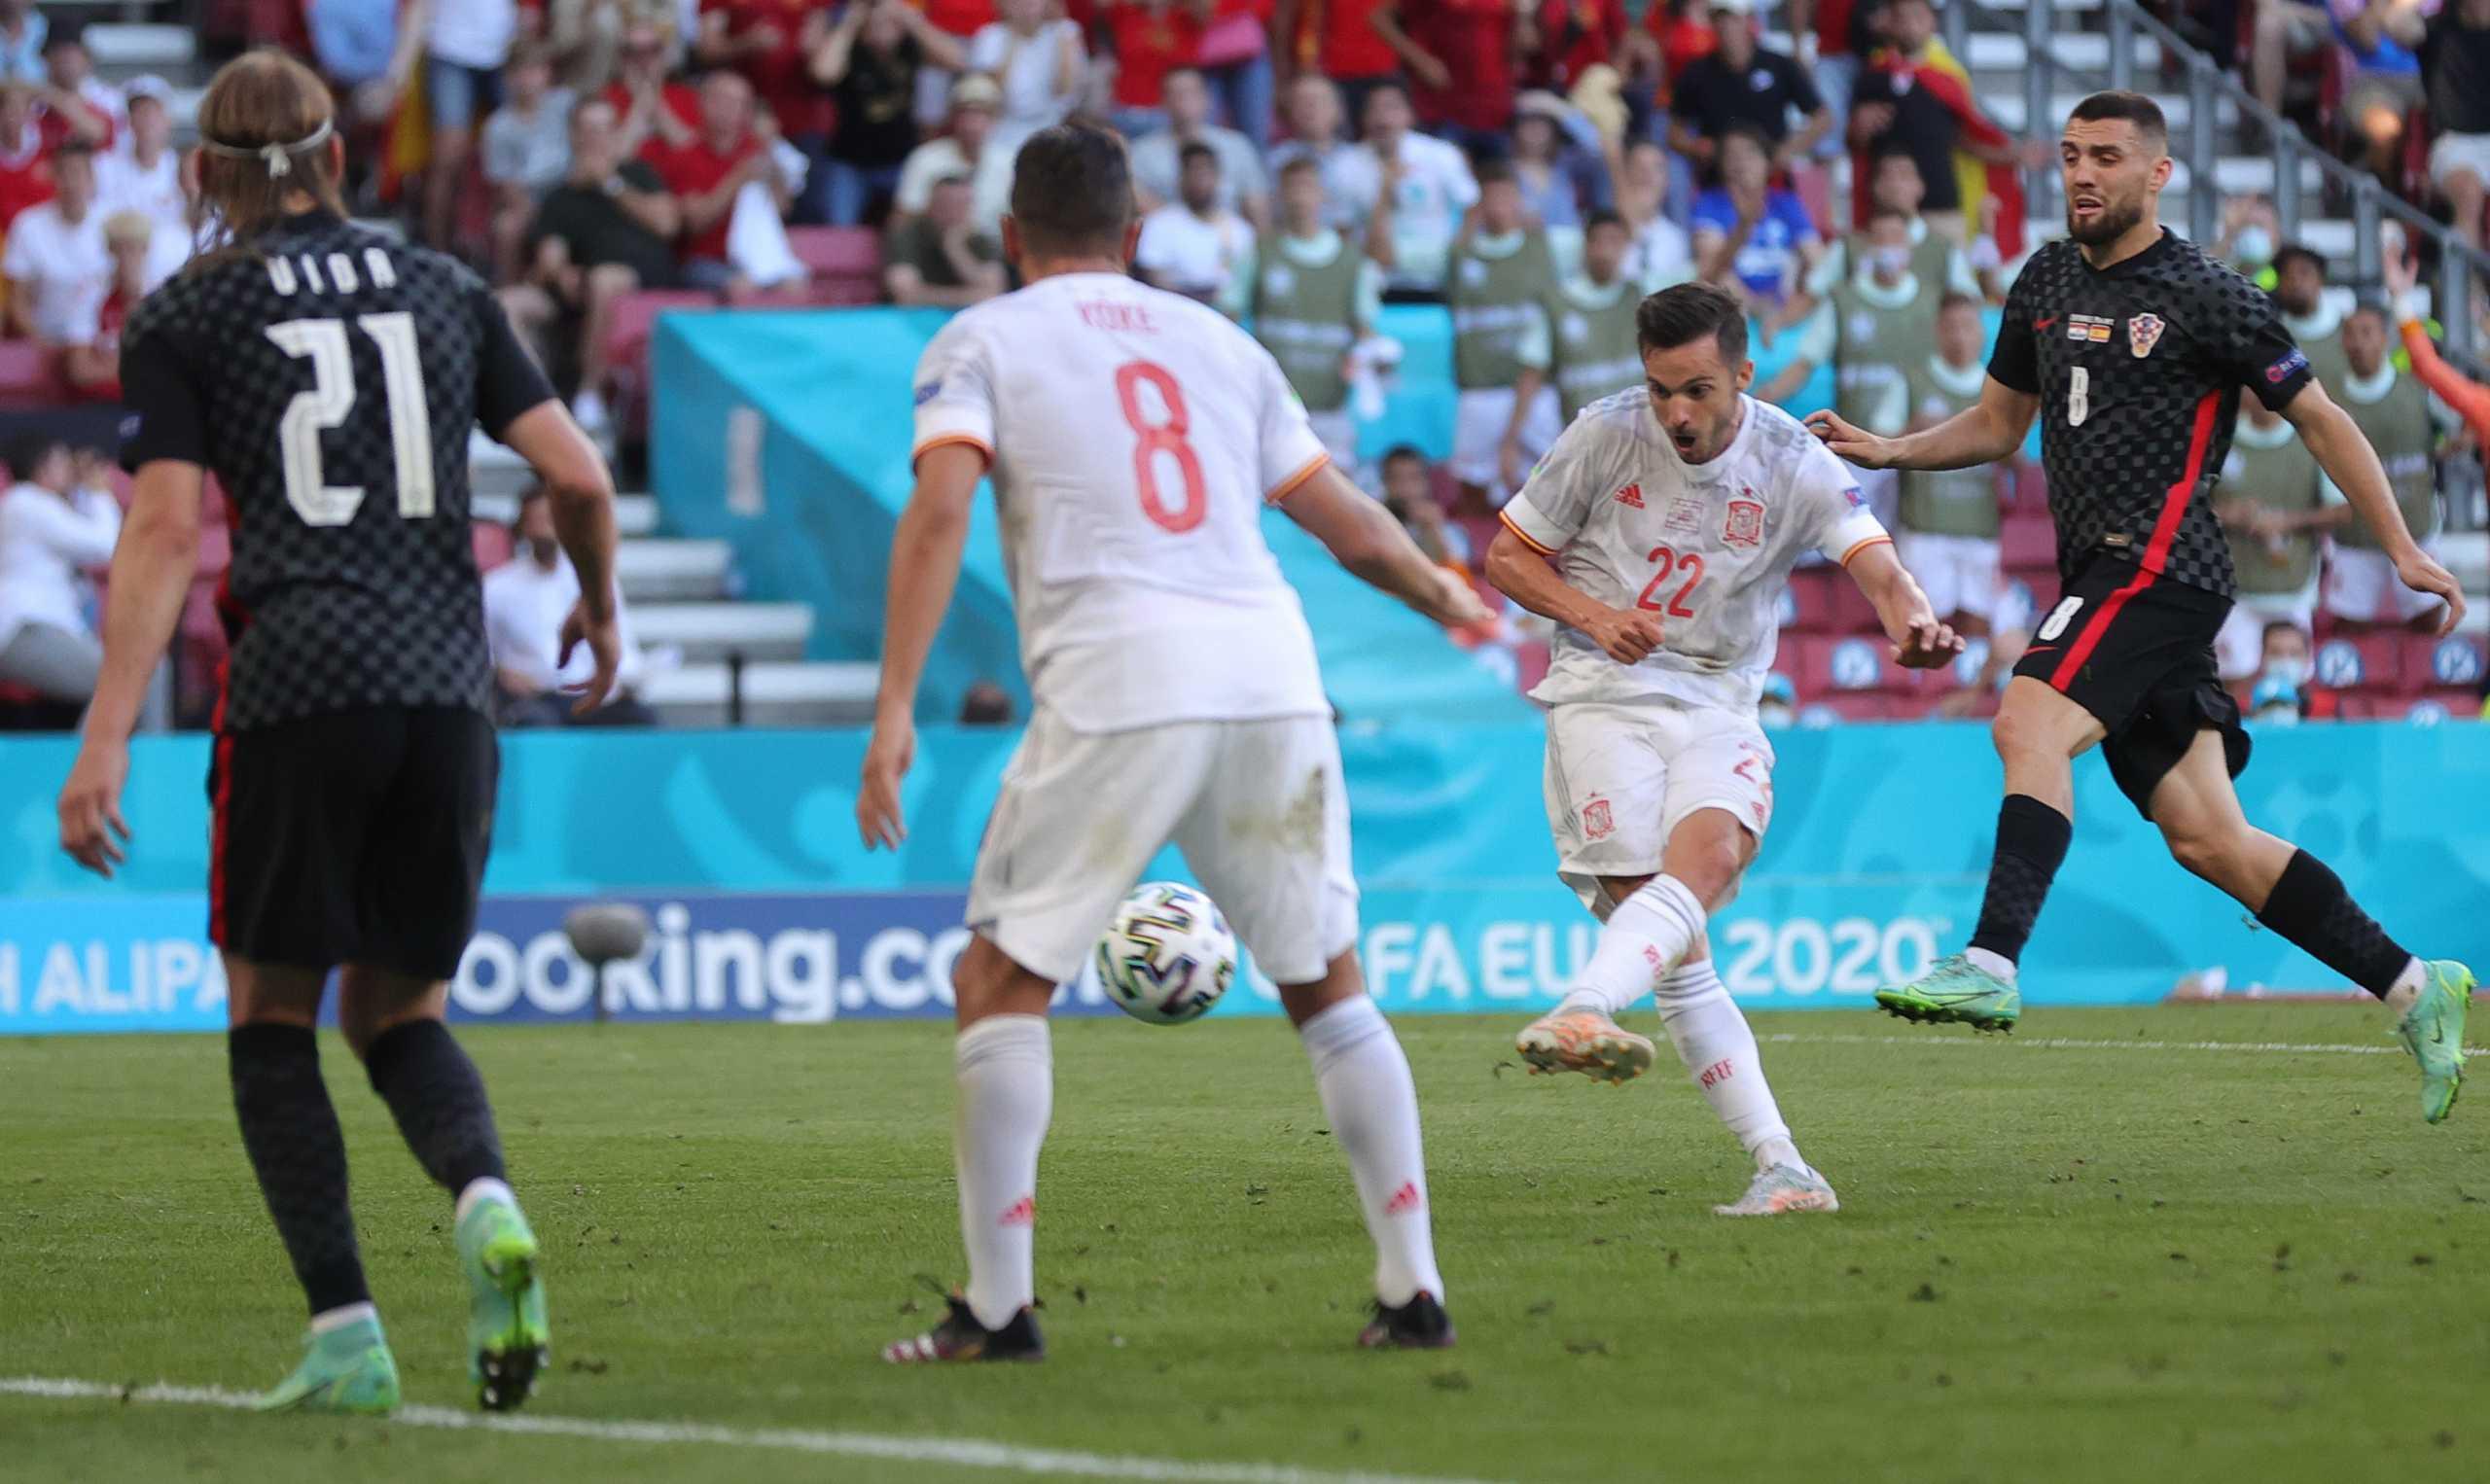 Euro 2020, Κροατία – Ισπανία: Άμεση «απάντηση» από τους Ίβηρες